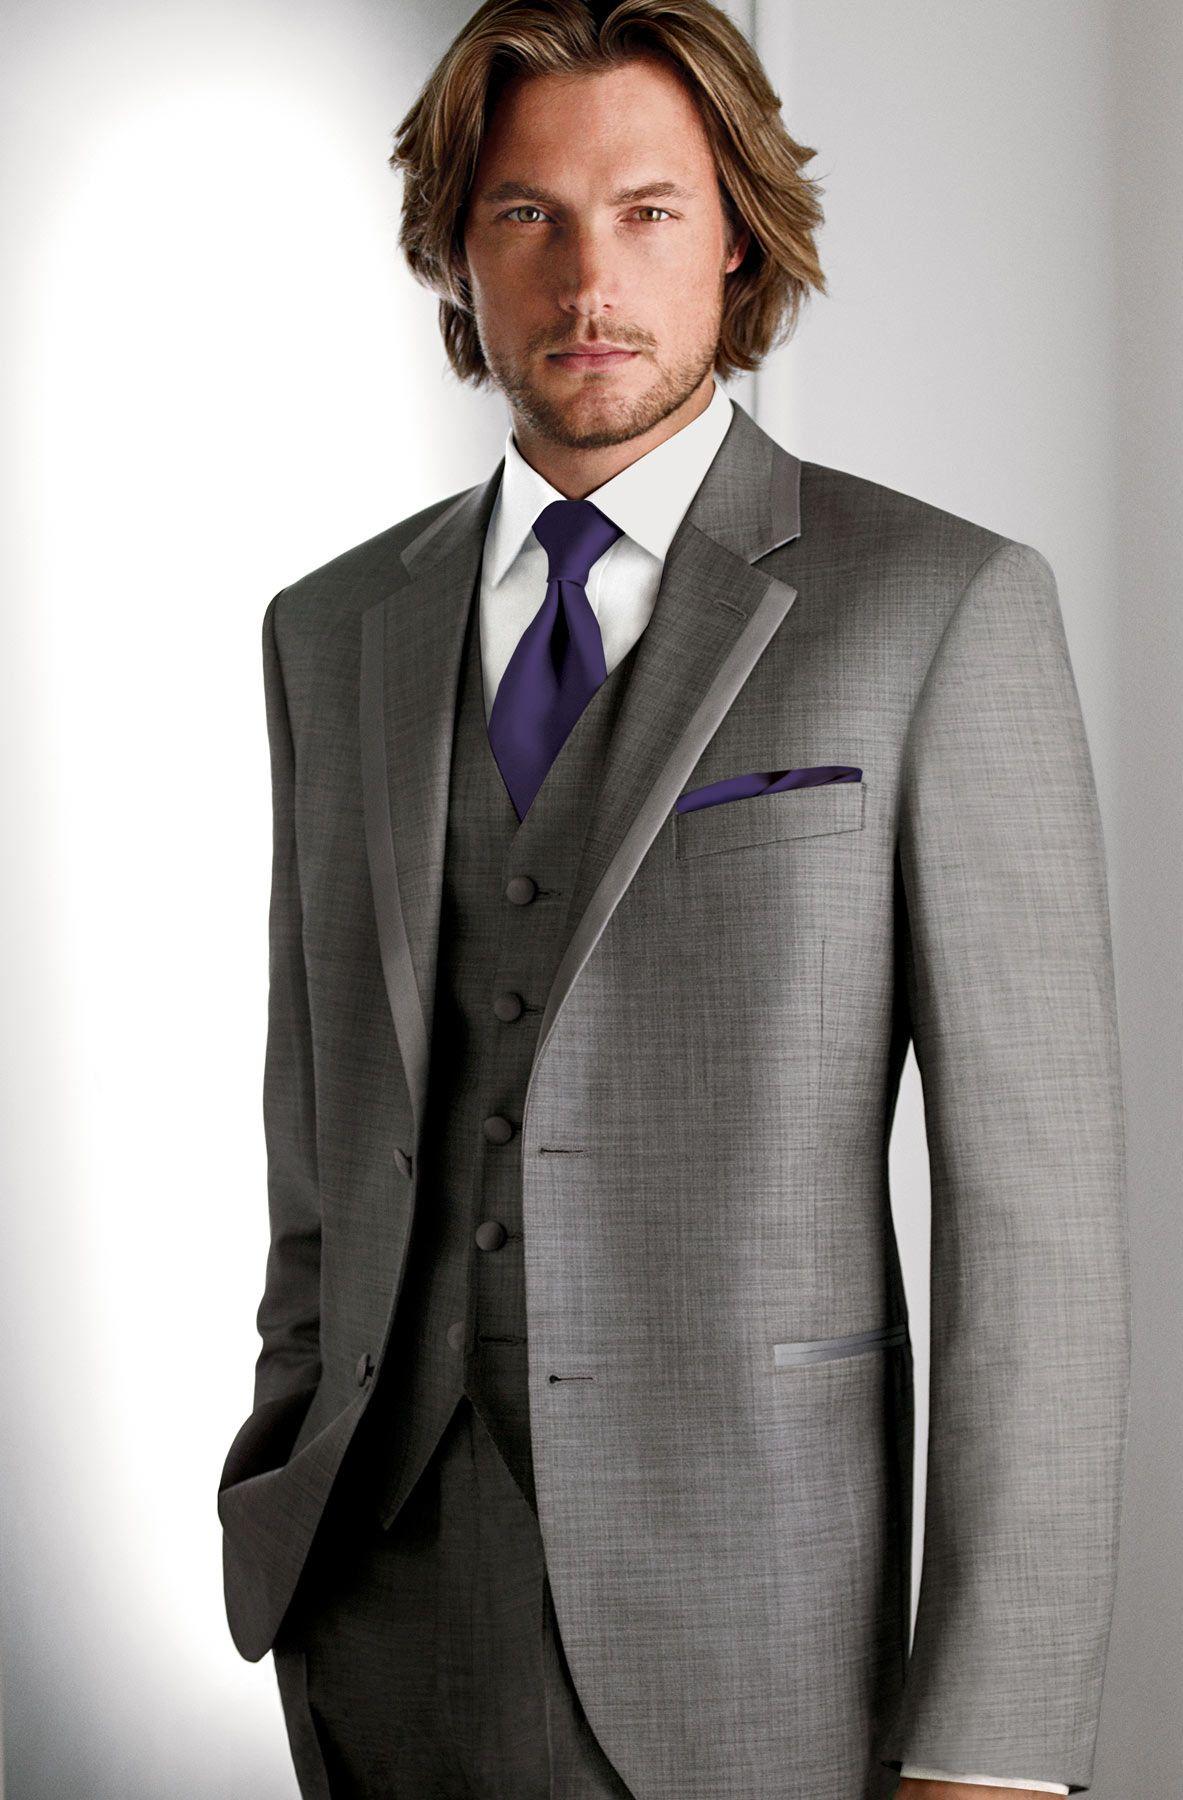 groomsmen (freeman) gray suit, purple tie and pocket square. gray ...